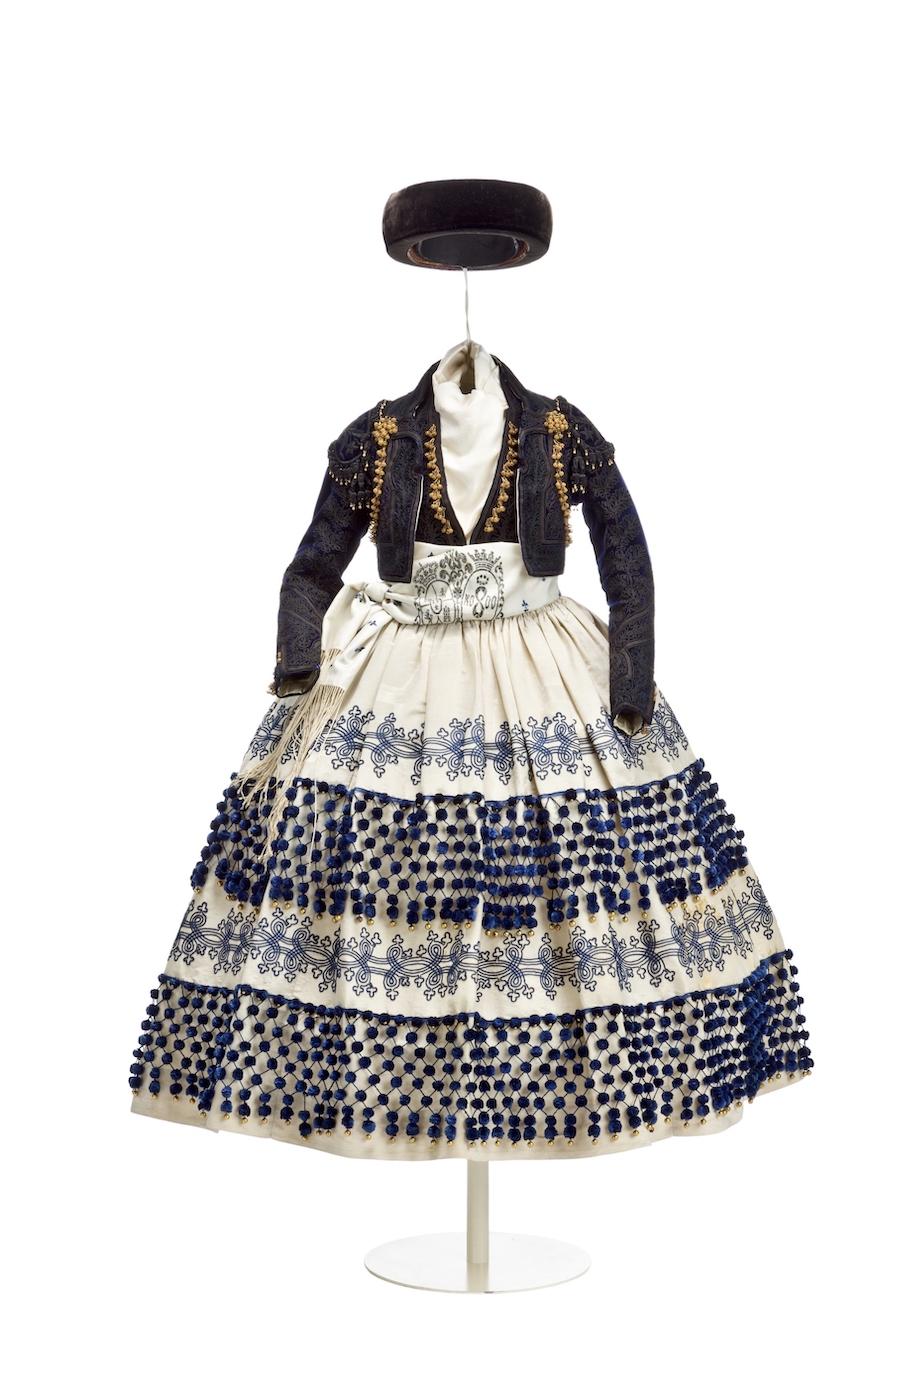 Traje de maja de infanta Isabel de Borbón. Hacia 1862. Museo del Traje. Madrid.